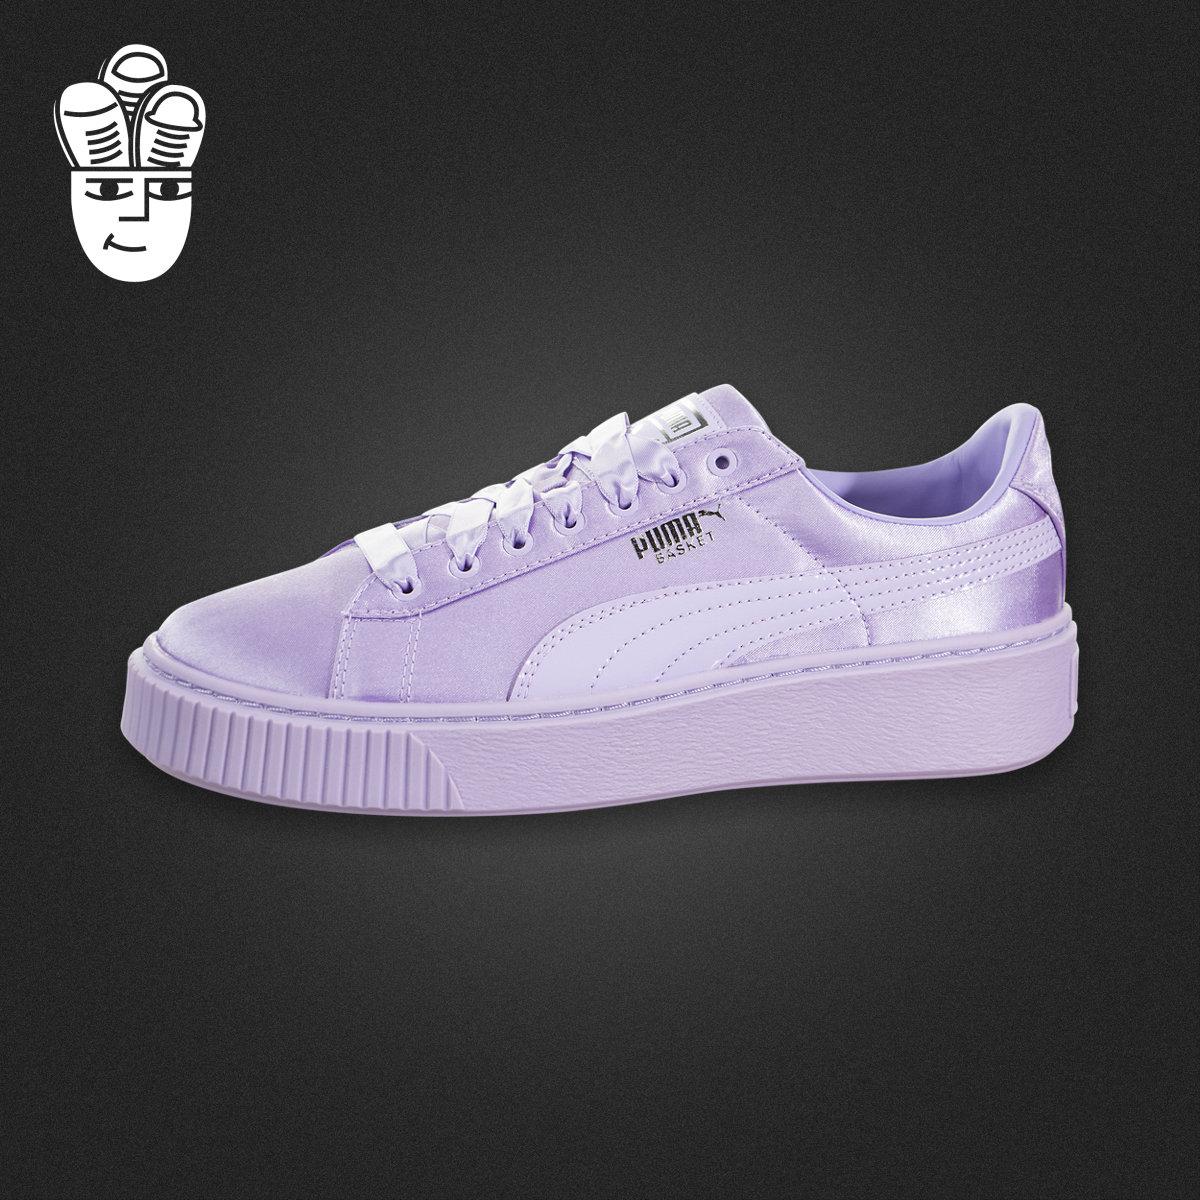 Puma Basket Platform Tween 彪马男鞋女鞋 松糕鞋 板鞋休闲鞋